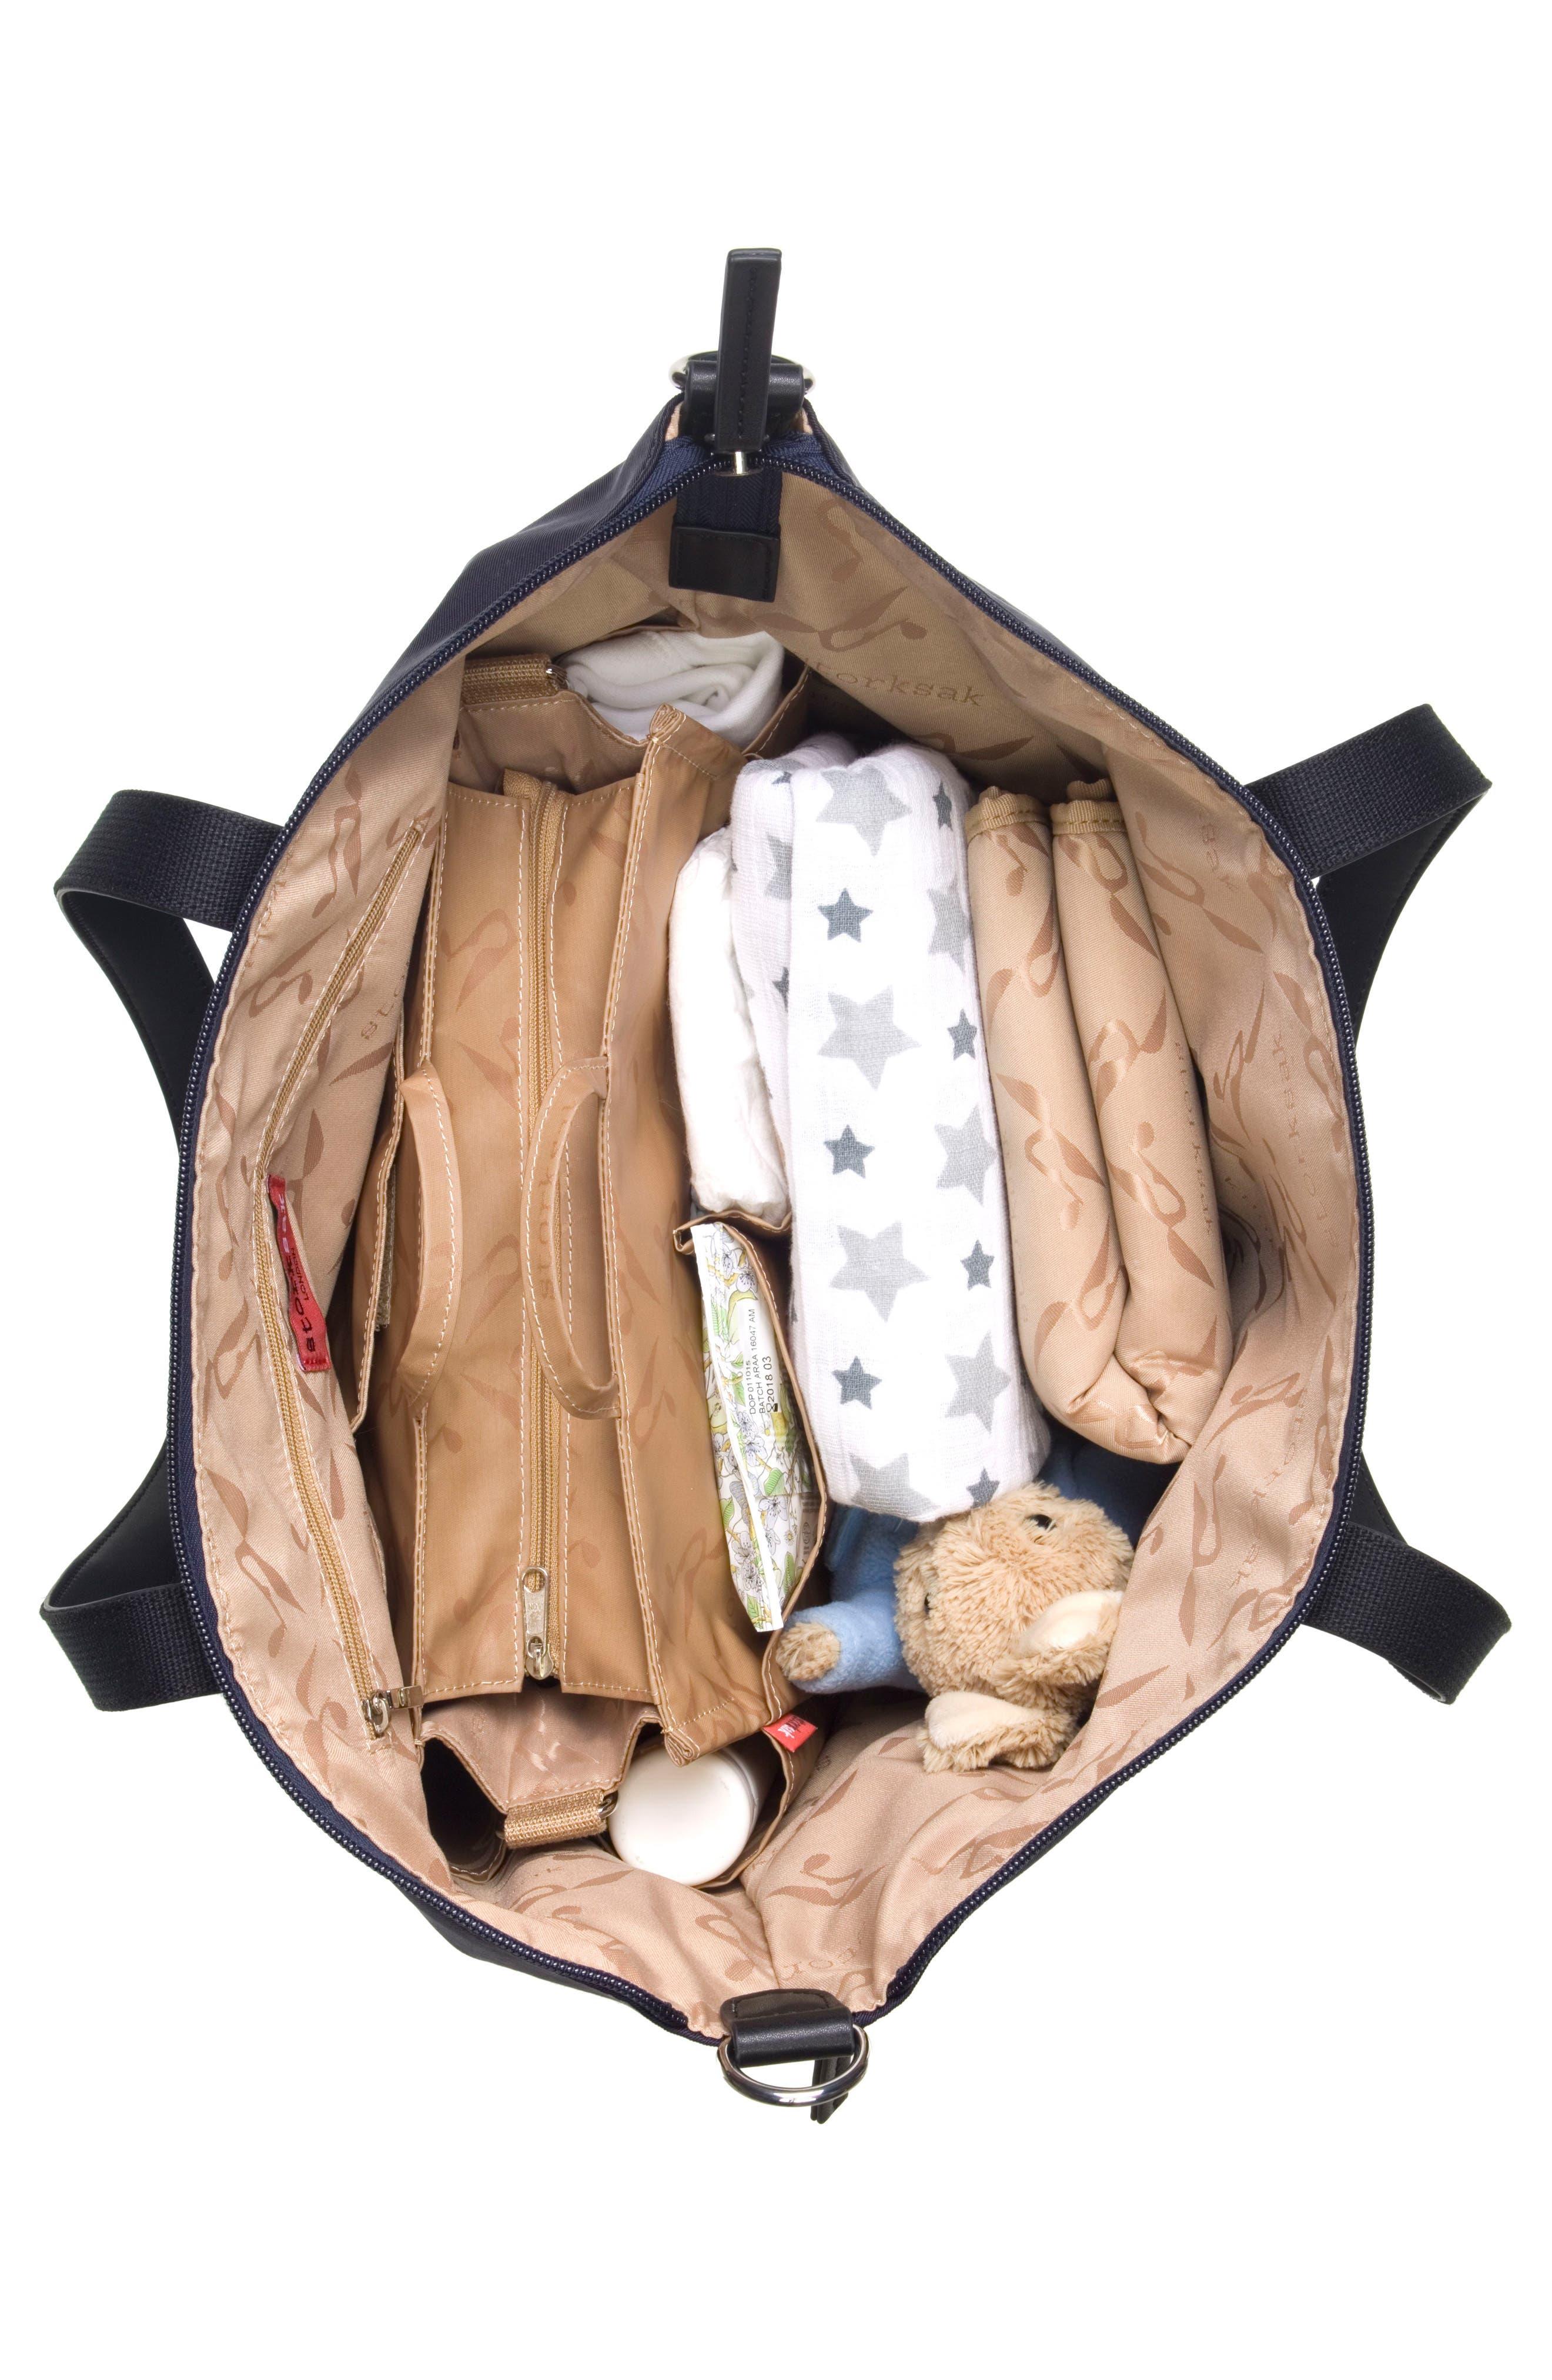 Noa Luxe Diaper Bag,                             Alternate thumbnail 4, color,                             Midnight Blue